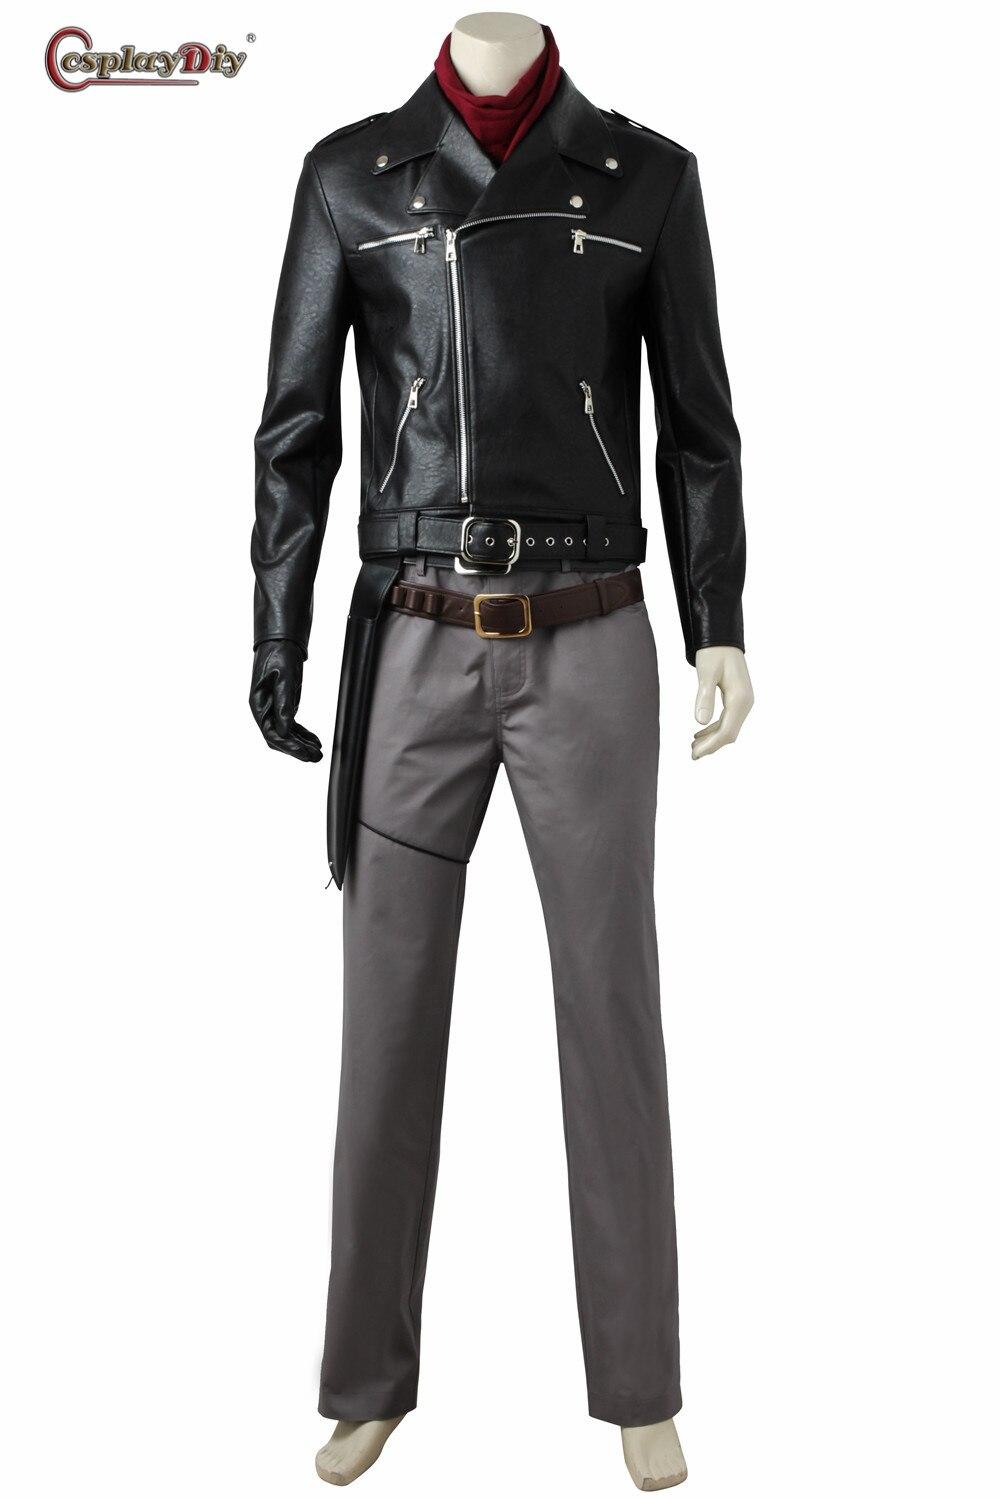 Jaqueta de cosplay masculina nikeric rick grimes, casaco preto com calças, fantasia de halloween